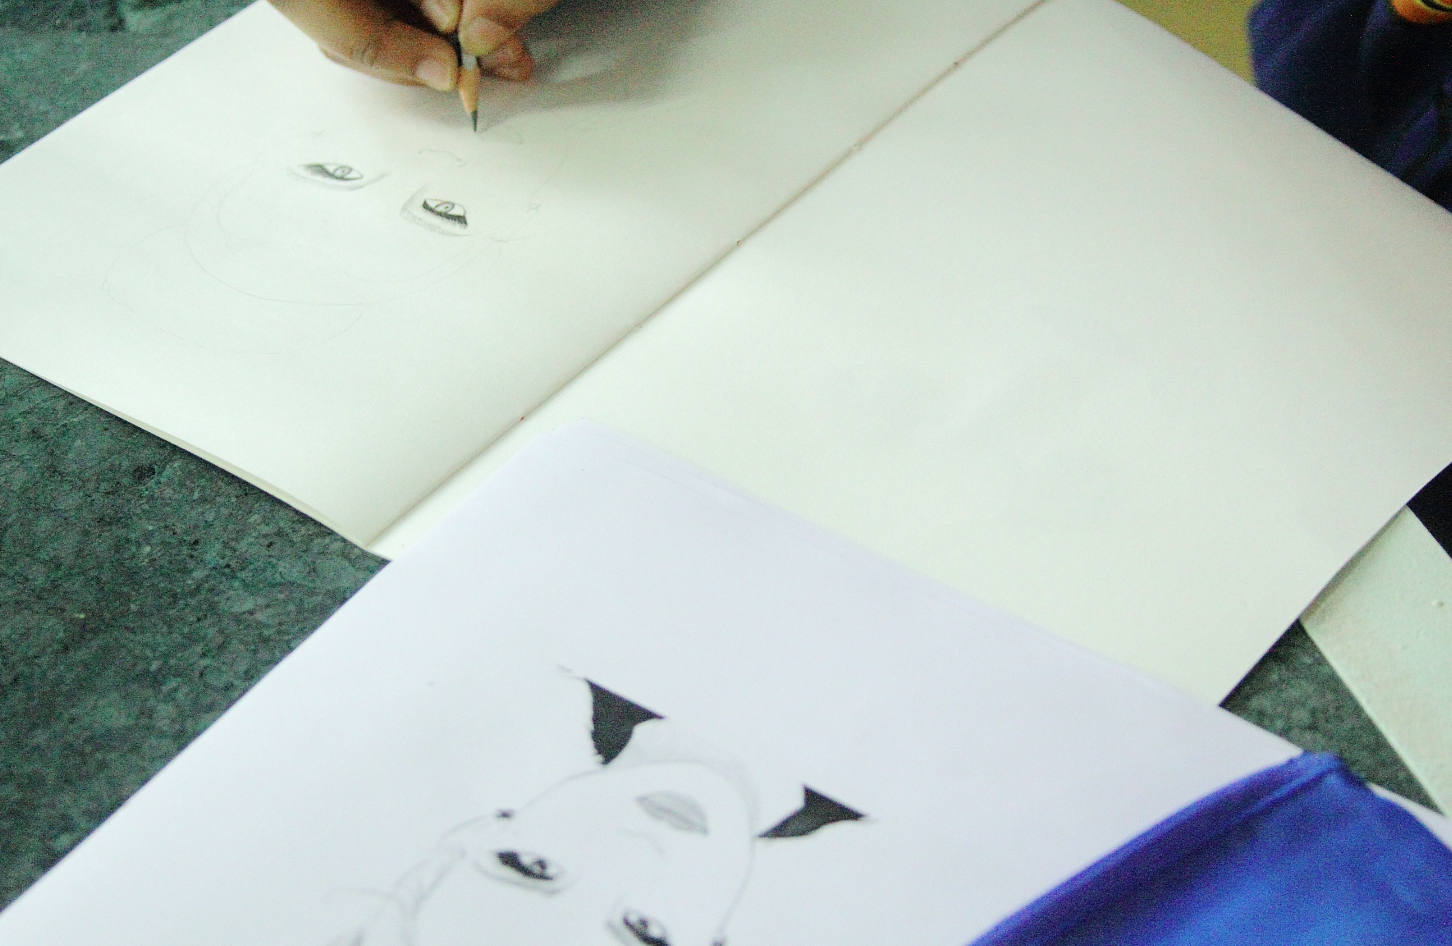 a drawing workshop this weekend